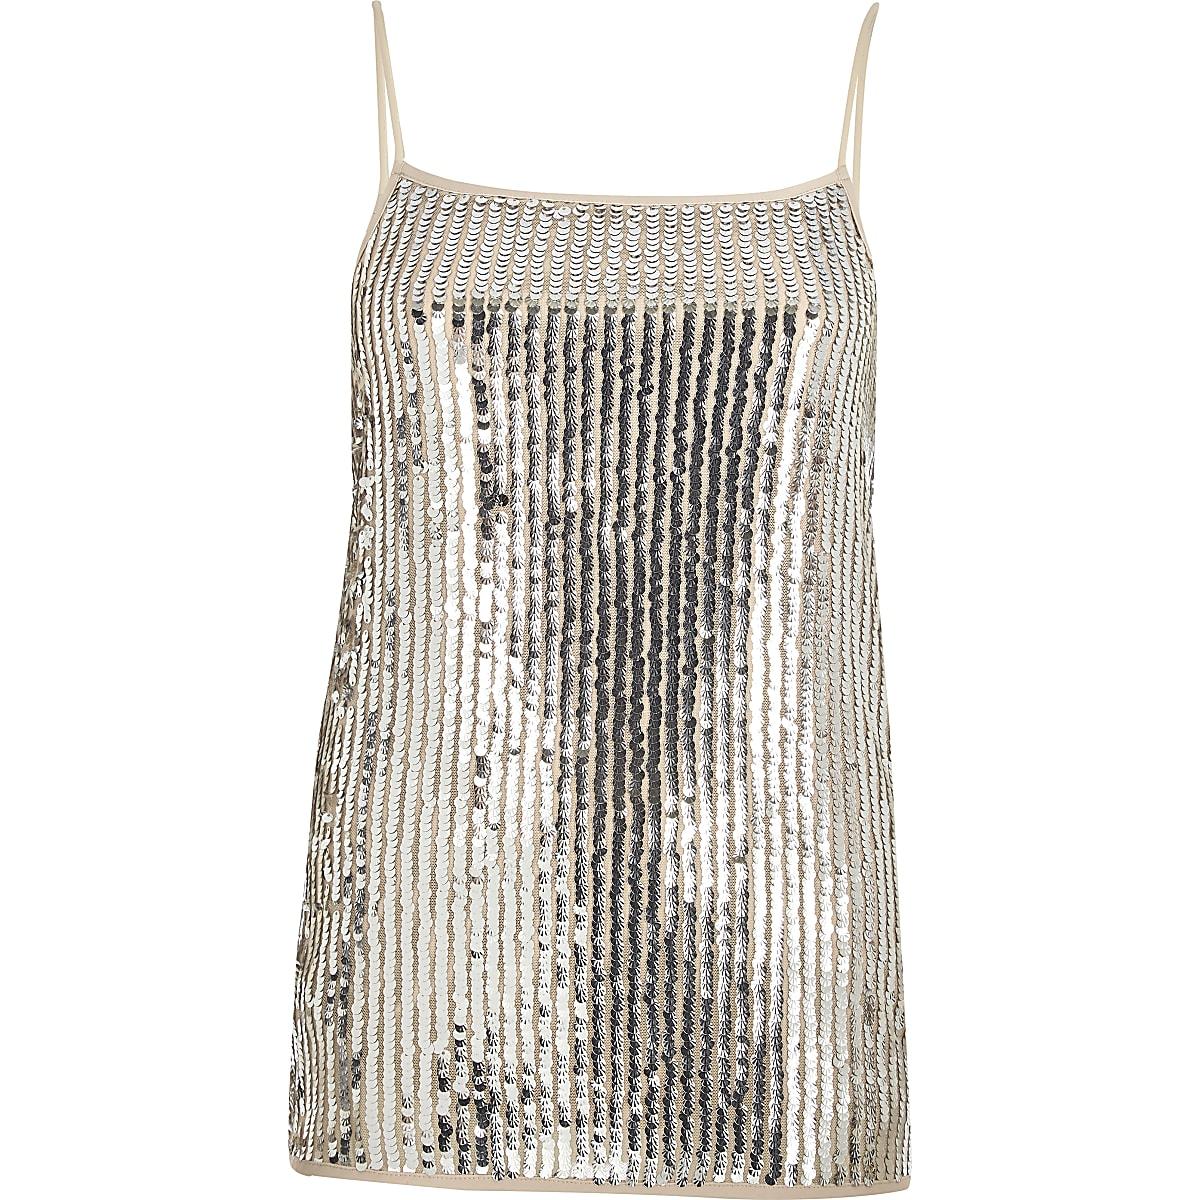 c80f27b4f1c387 Silver sequin cami top - Cami   Sleeveless Tops - Tops - women